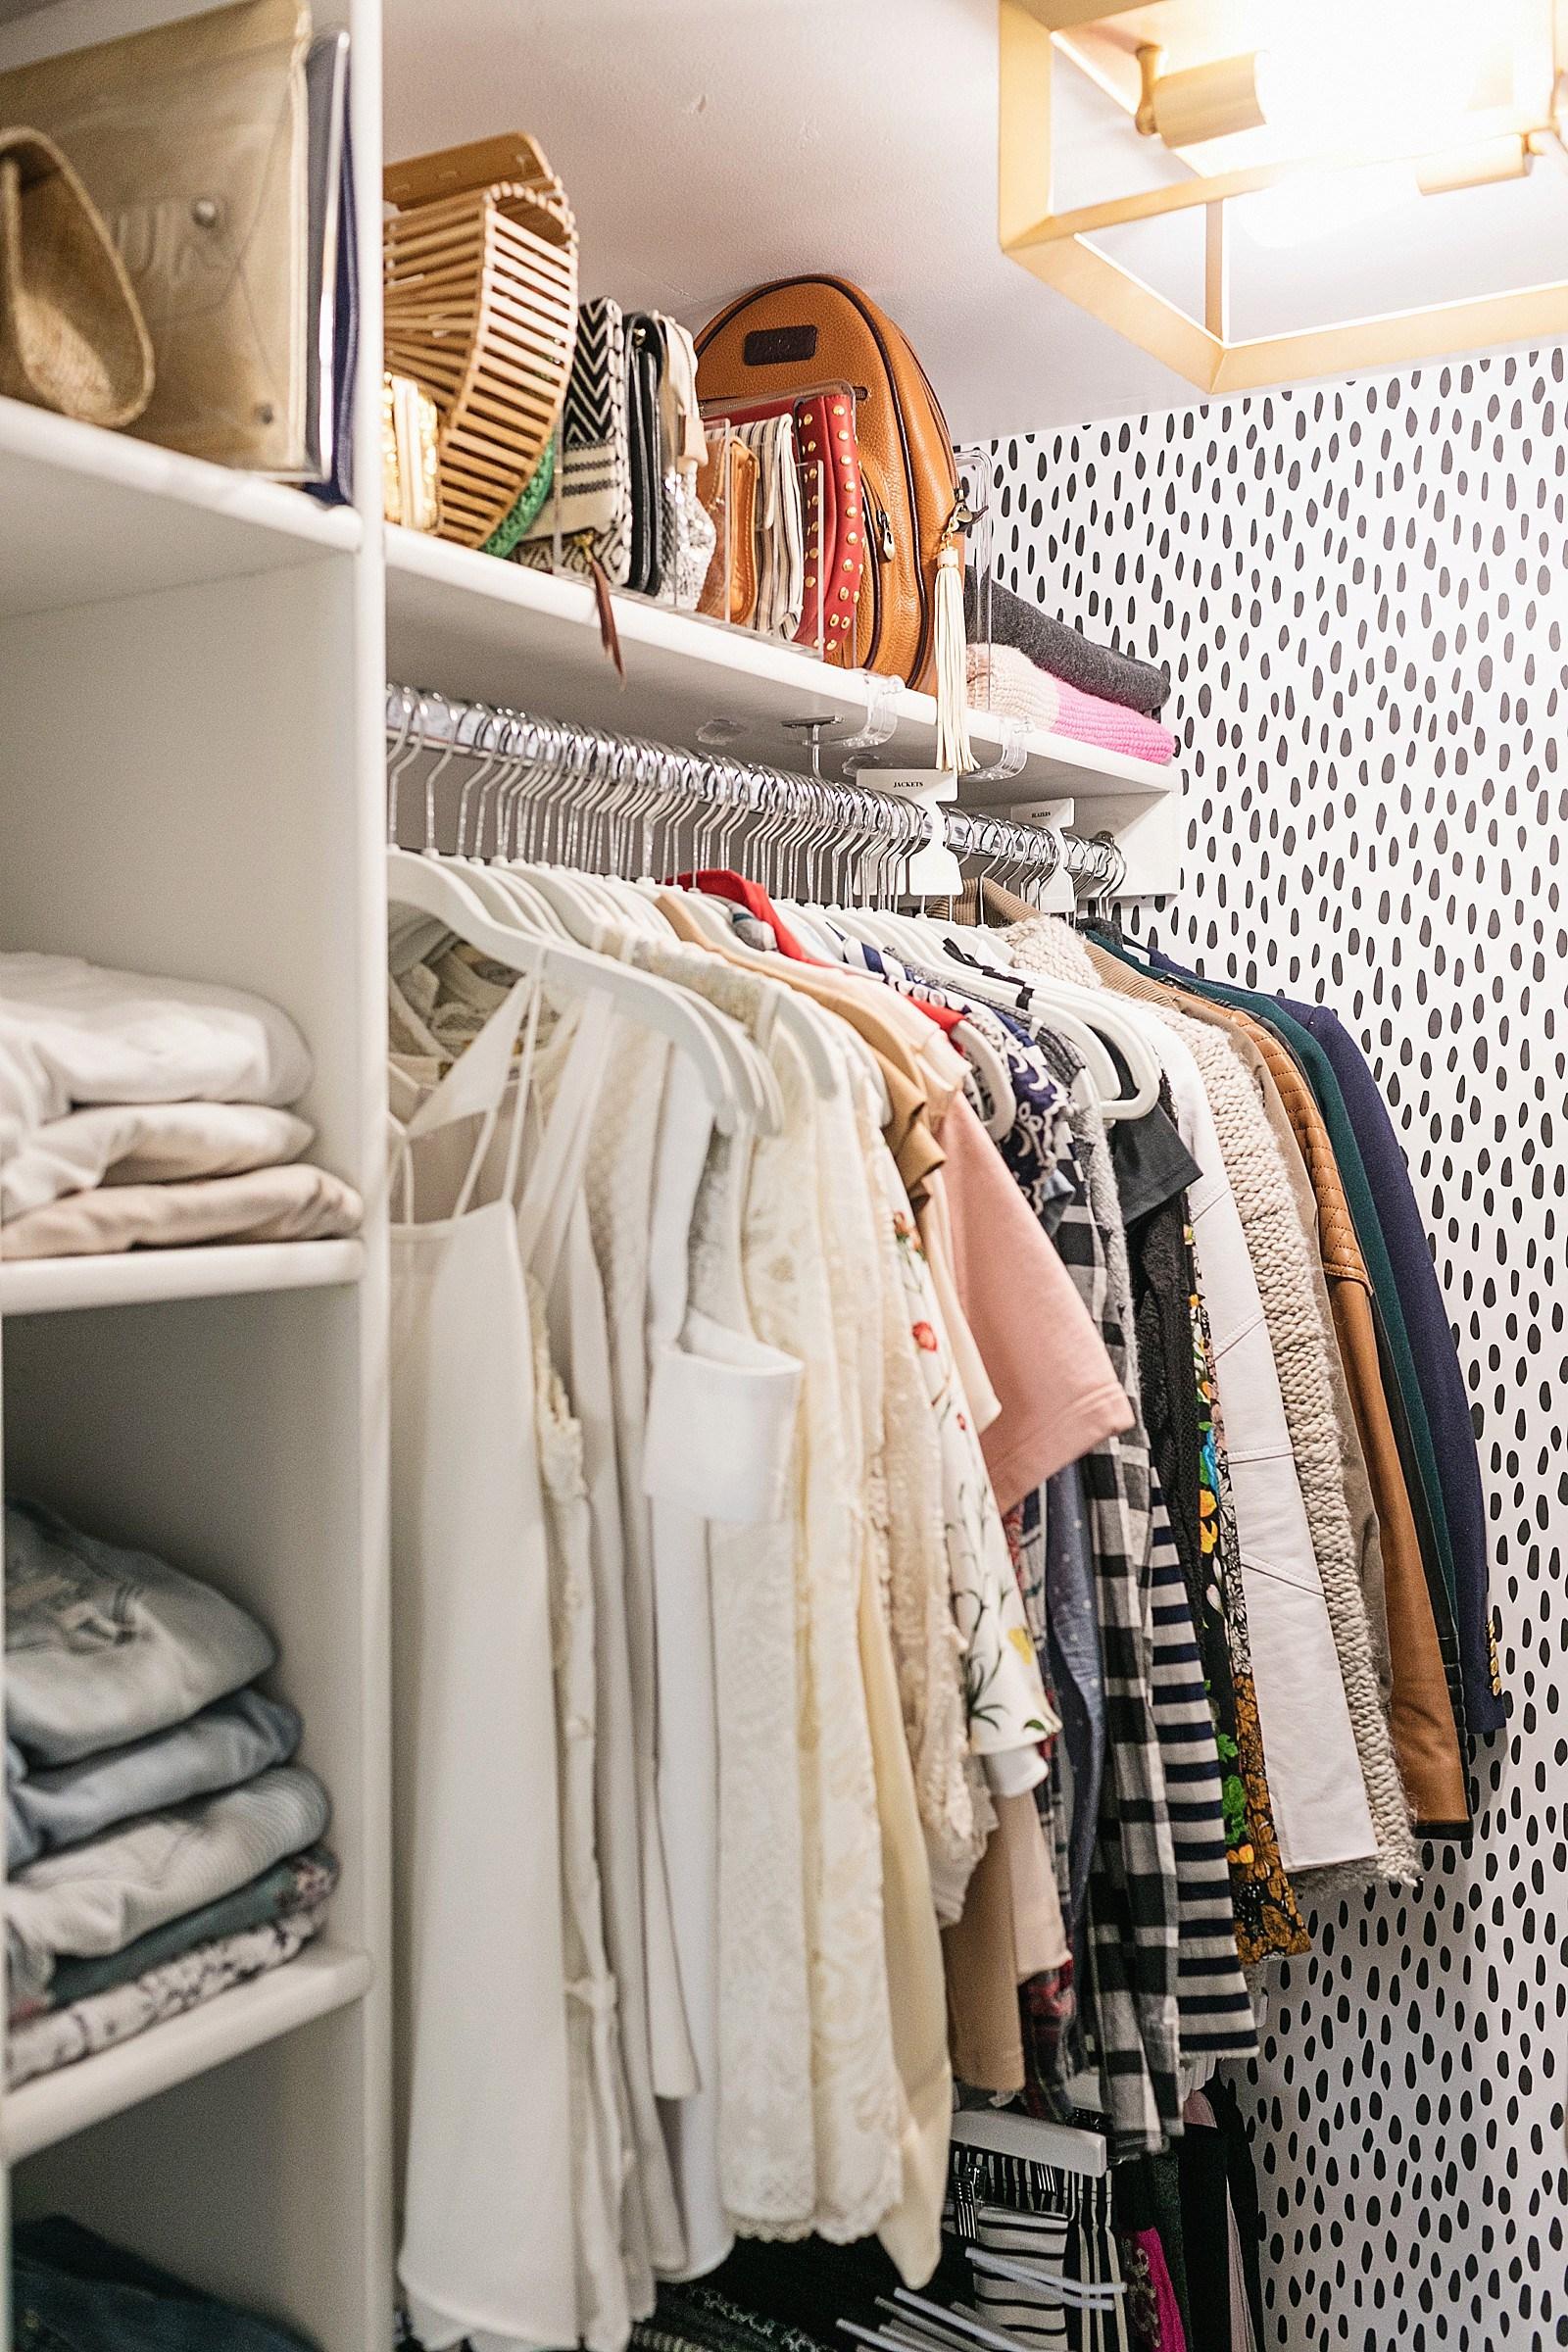 The upper shelf in an organized closet